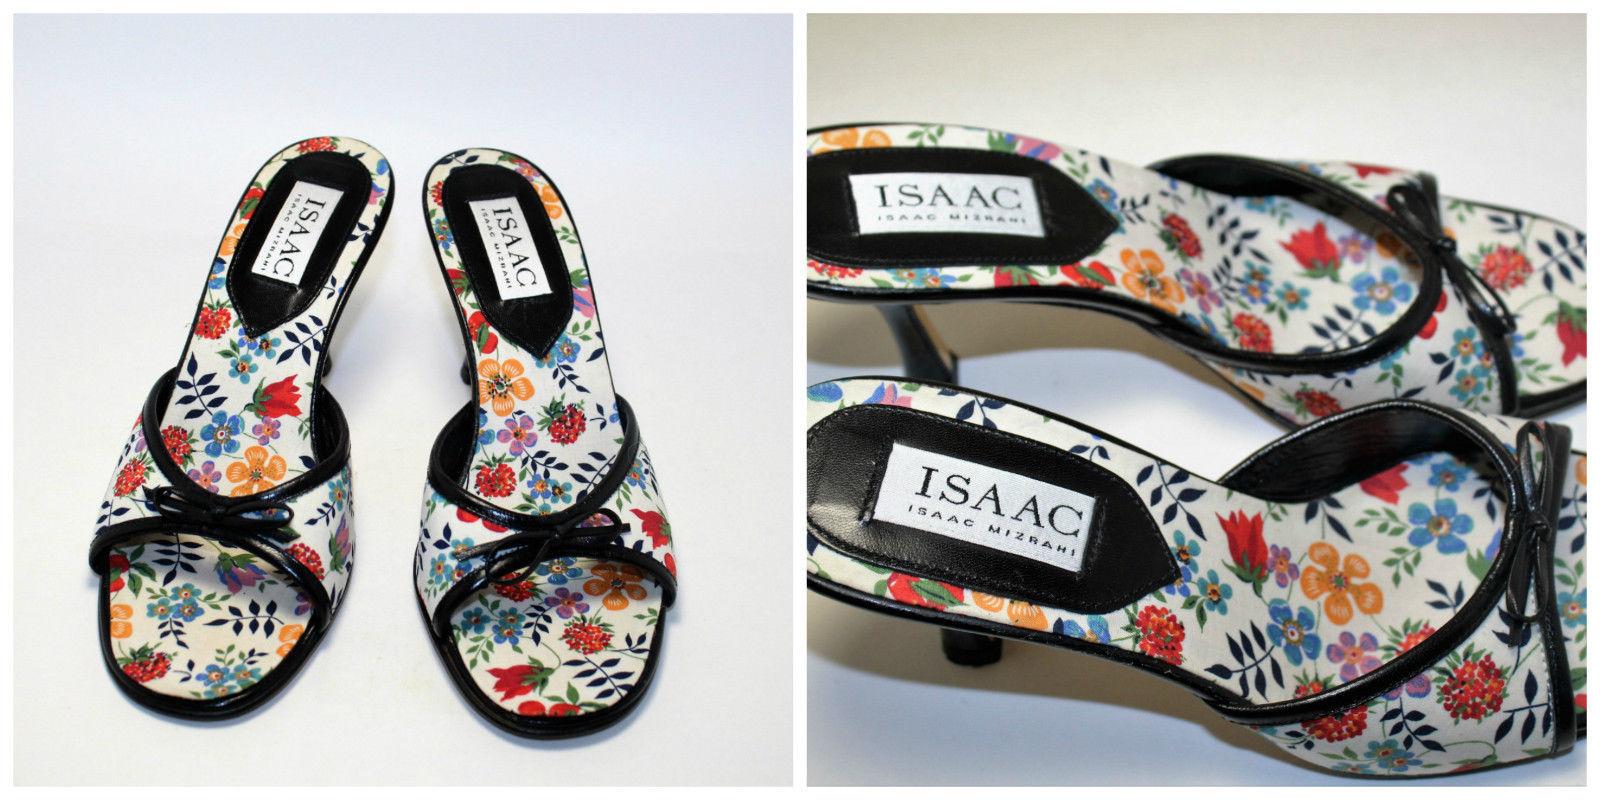 Womens Isaac Mizrahi White Floral Pattern Bow Slide Heels Size 7 1/2 B - $37.62